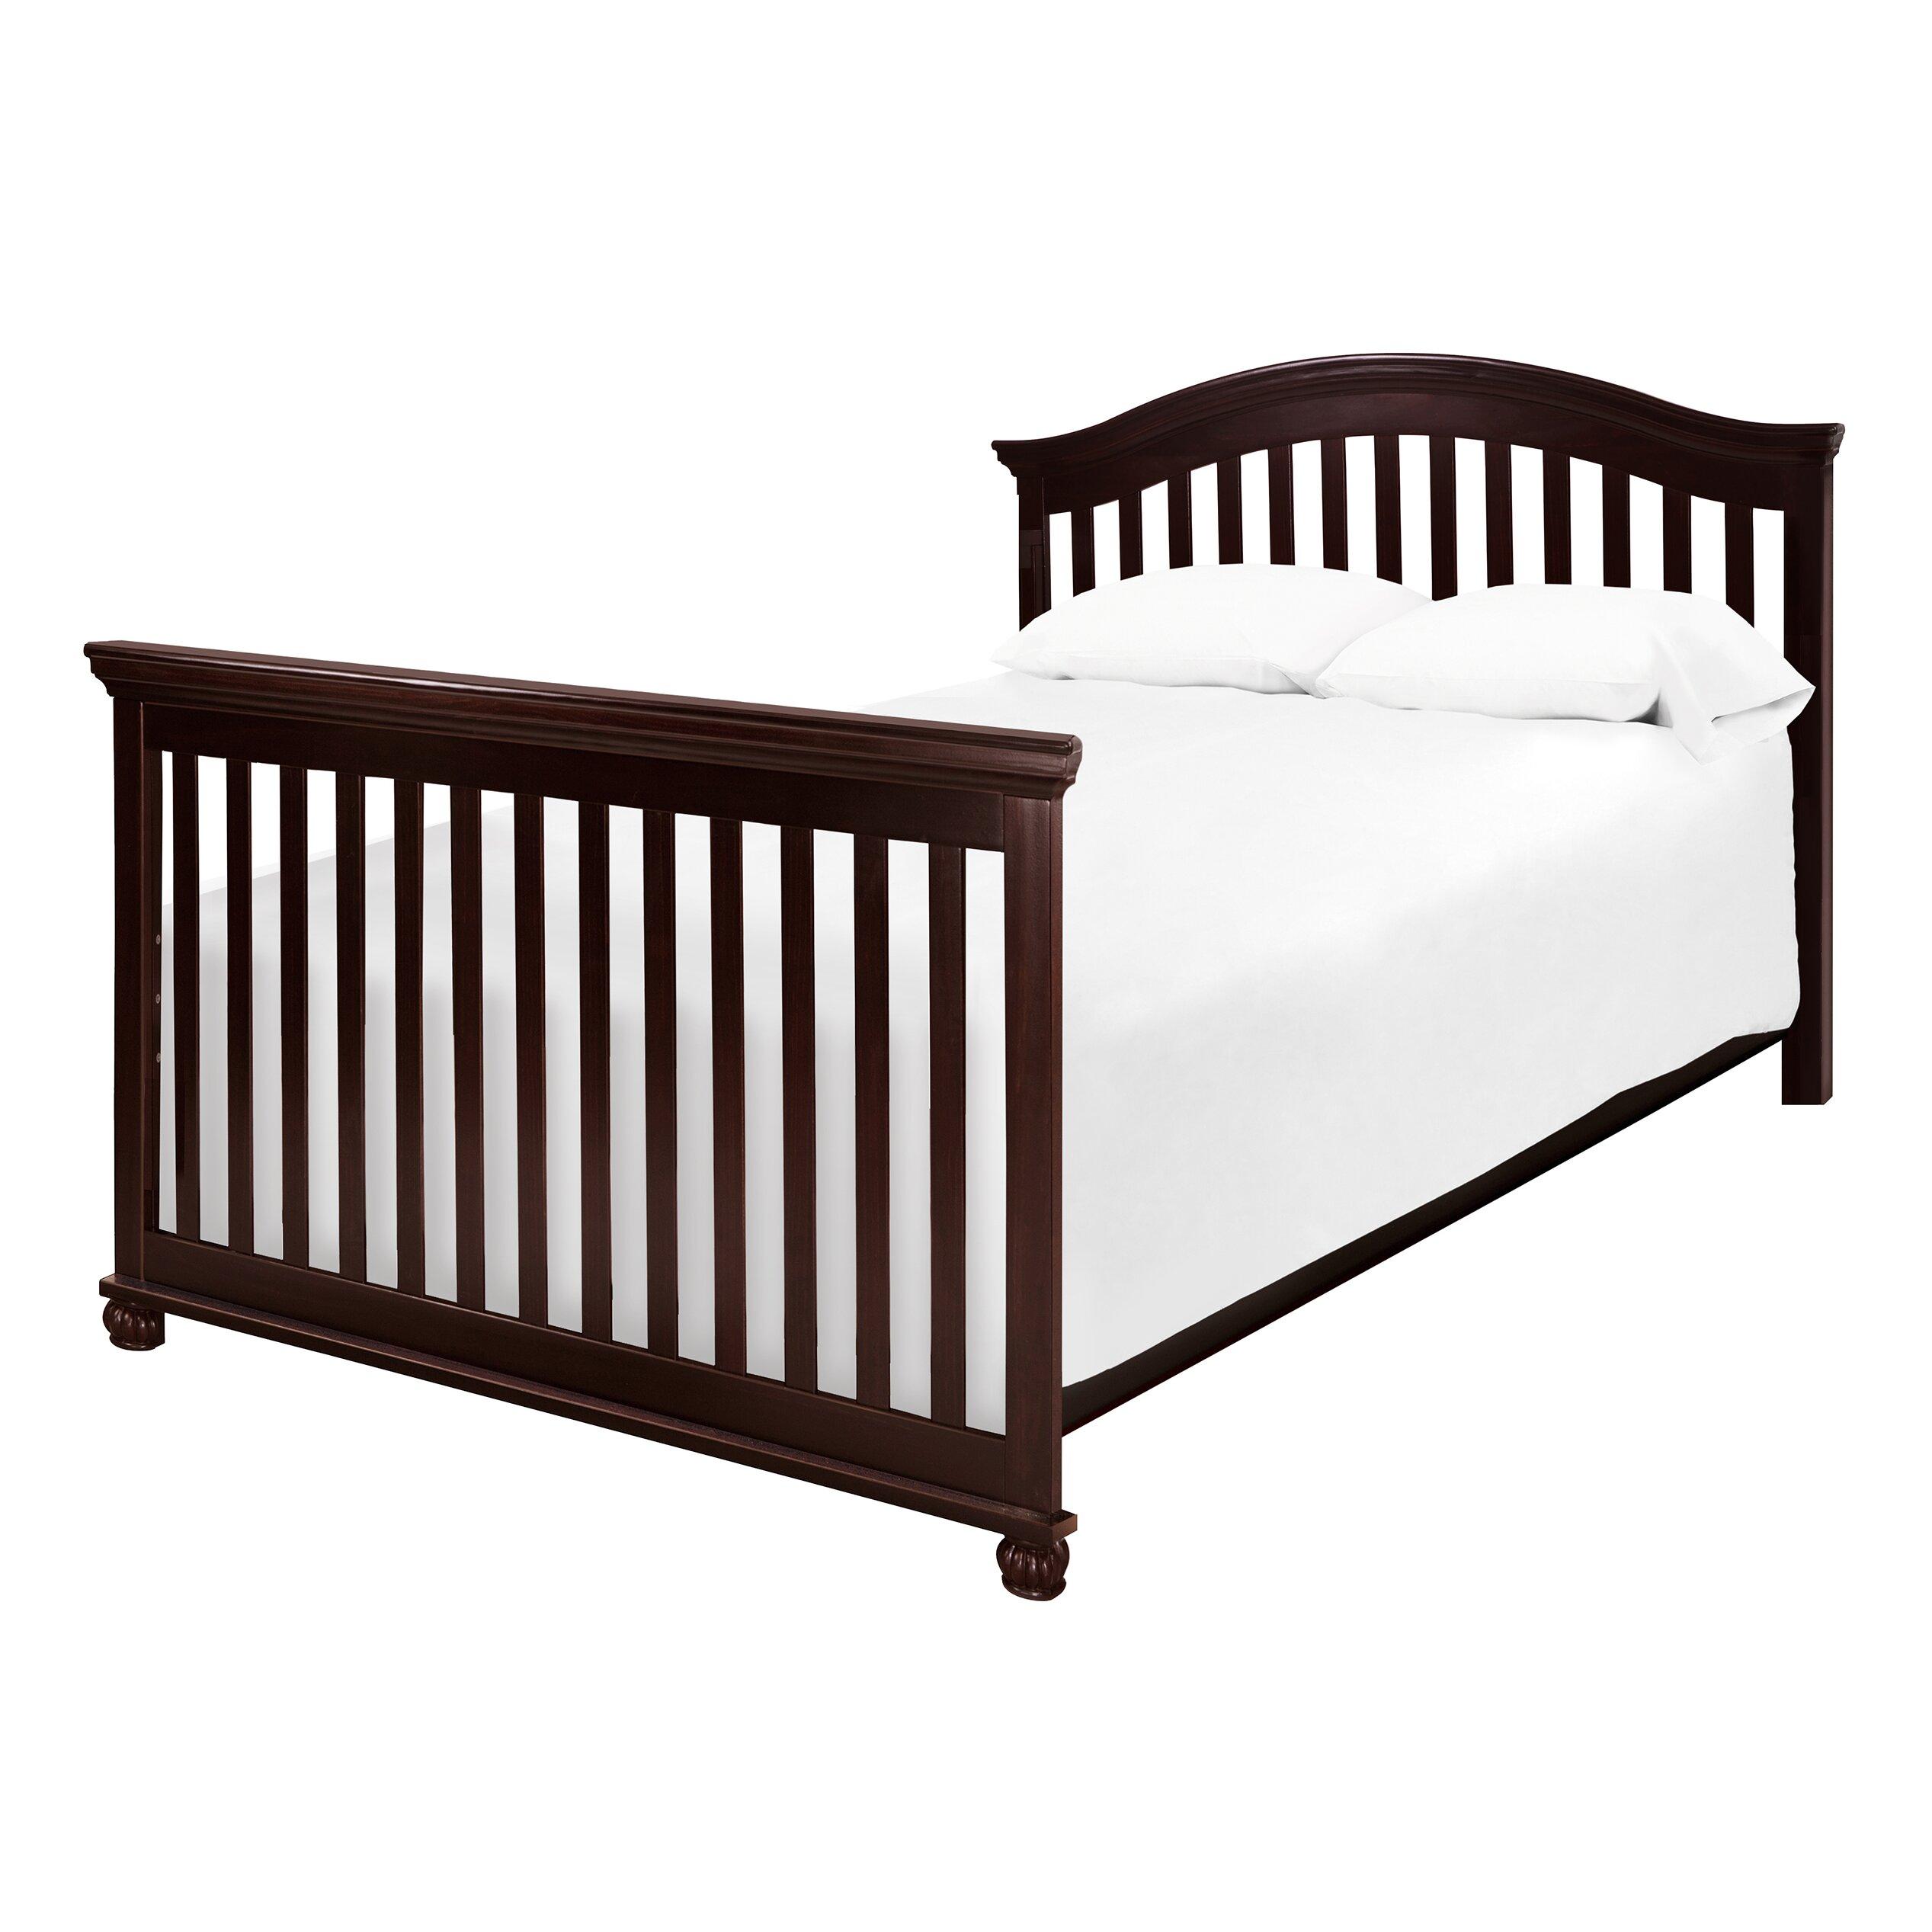 DaVinci Sherwood 4-in-1 Convertible Crib | Wayfair